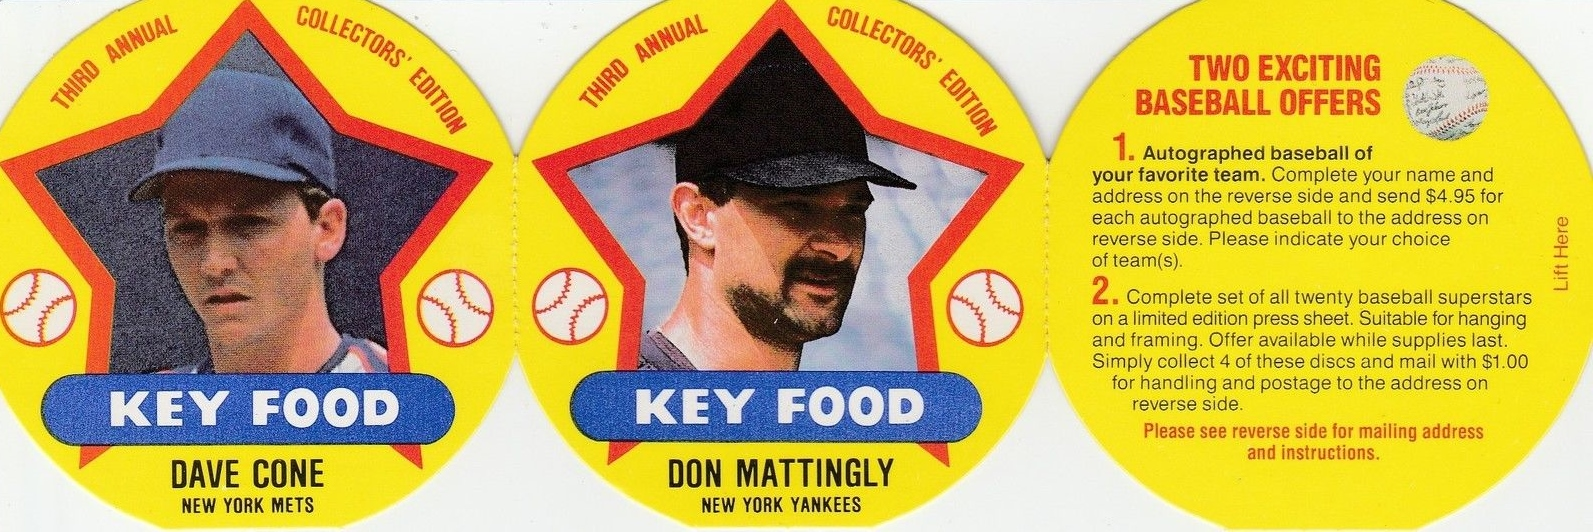 1989 mattingly